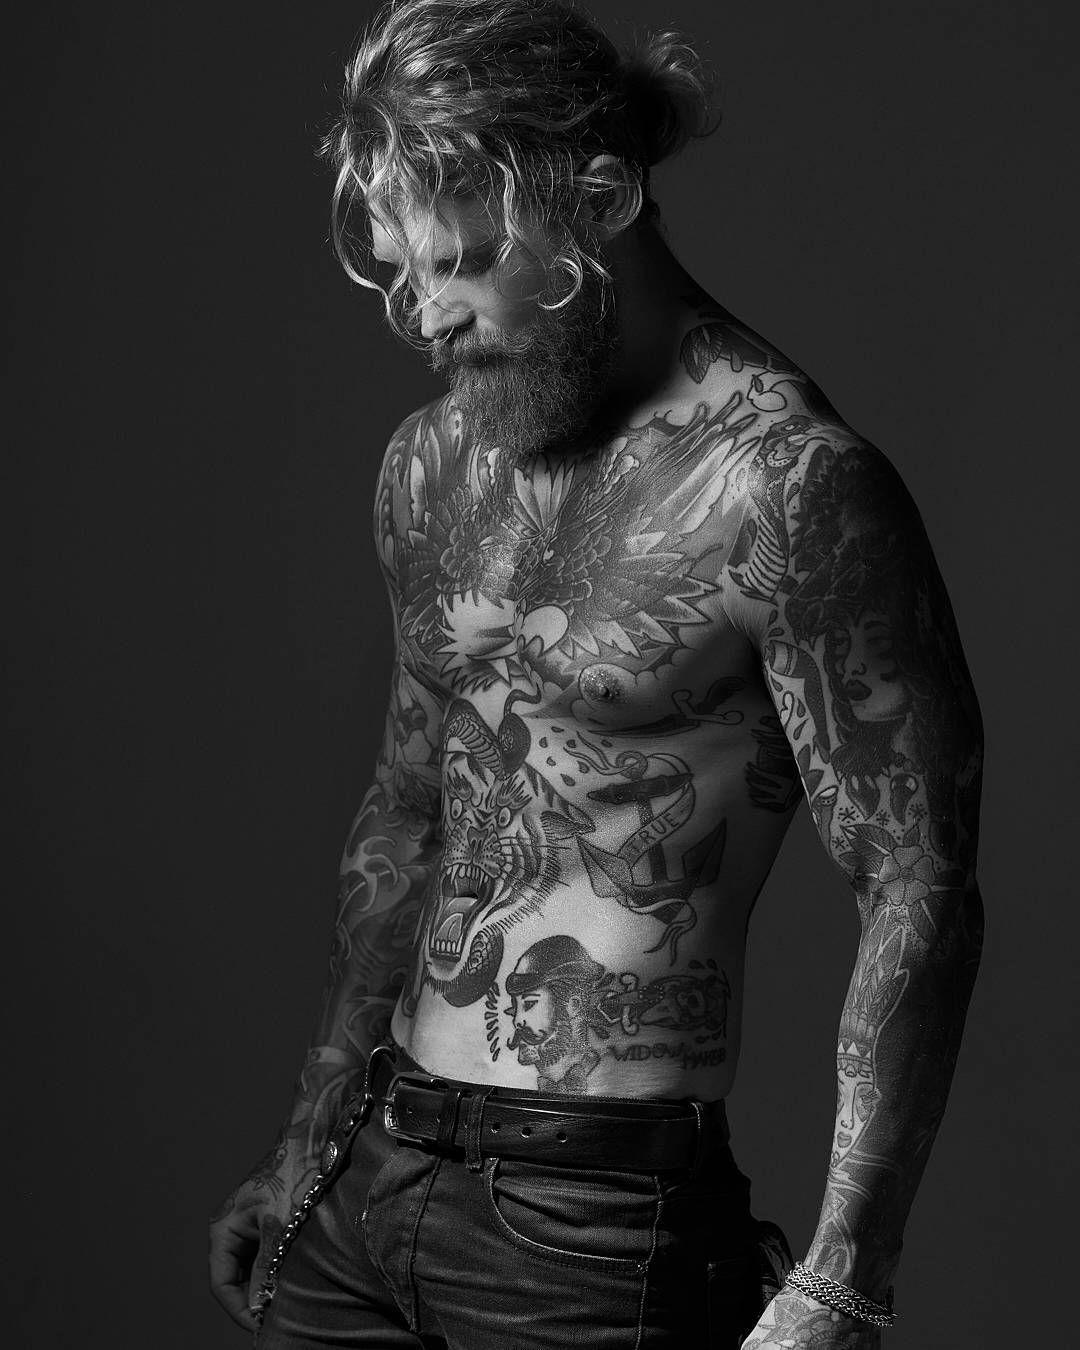 108 Best Badass Tattoos For Men: Consulta Esta Foto De Instagram De @spizoiky • 17.5 Mil Me